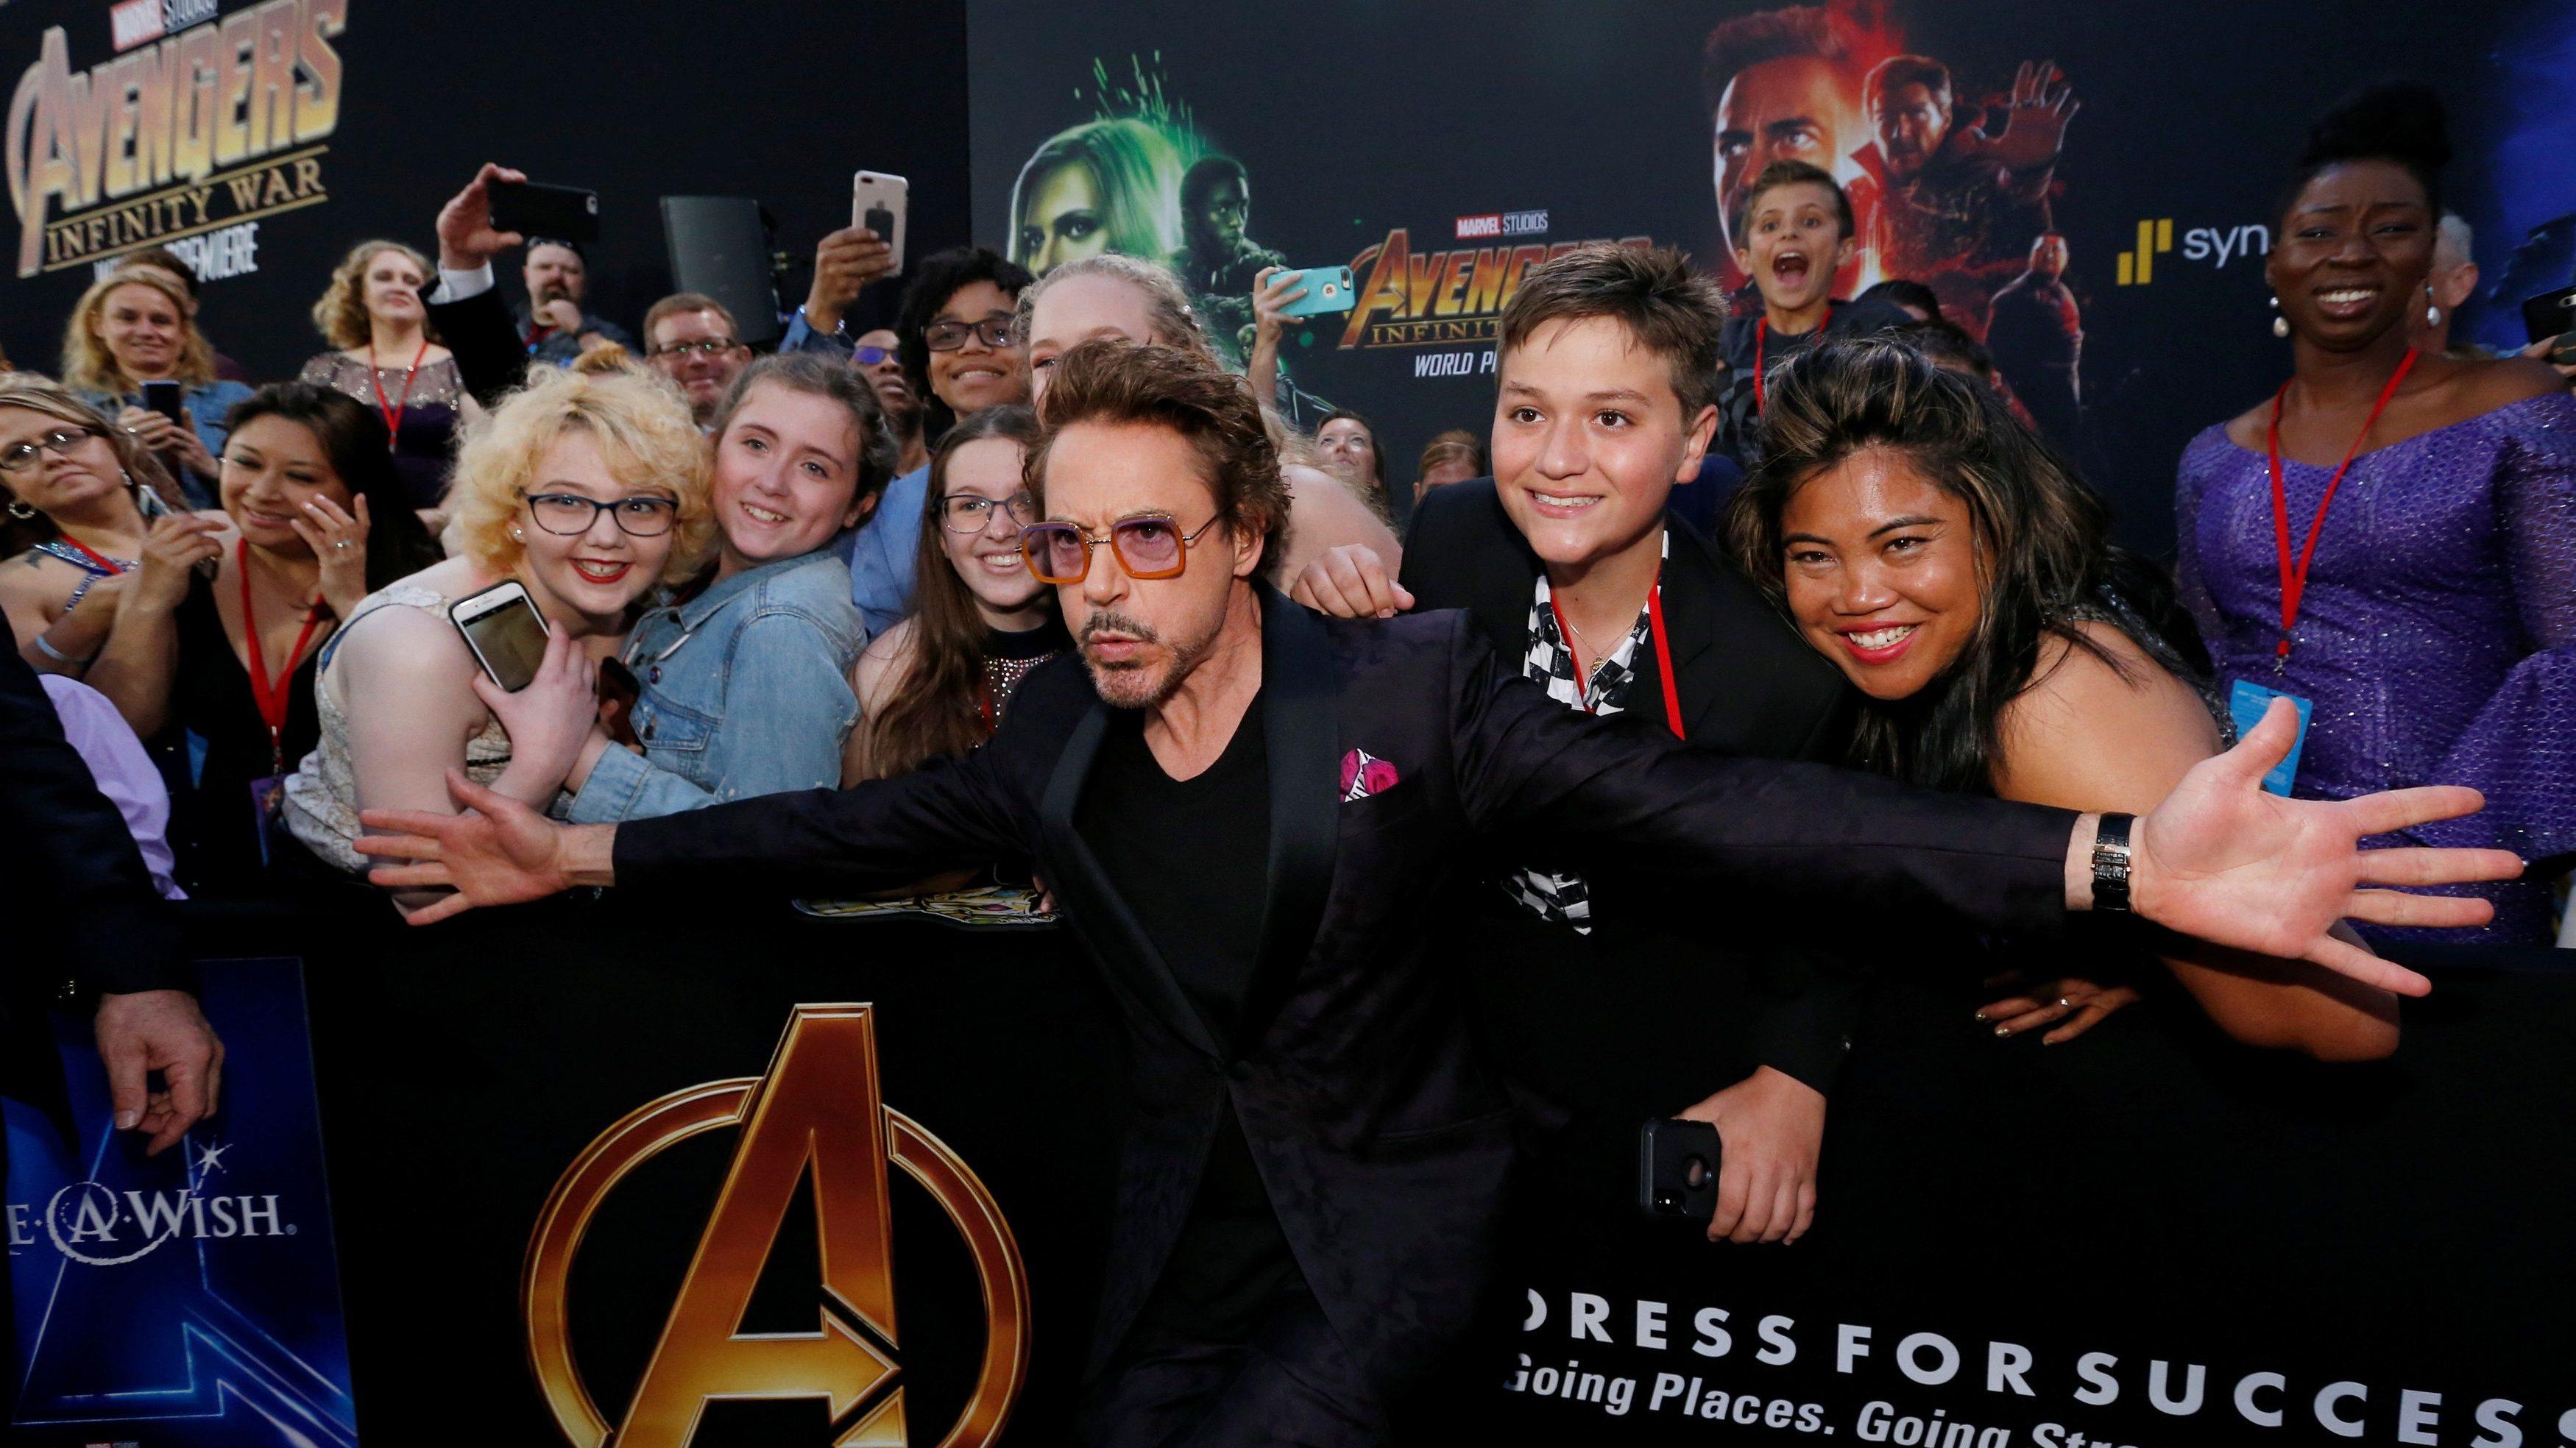 Infinity War' Assembles Record-Breaking $630 Million Global Debut — Avengers